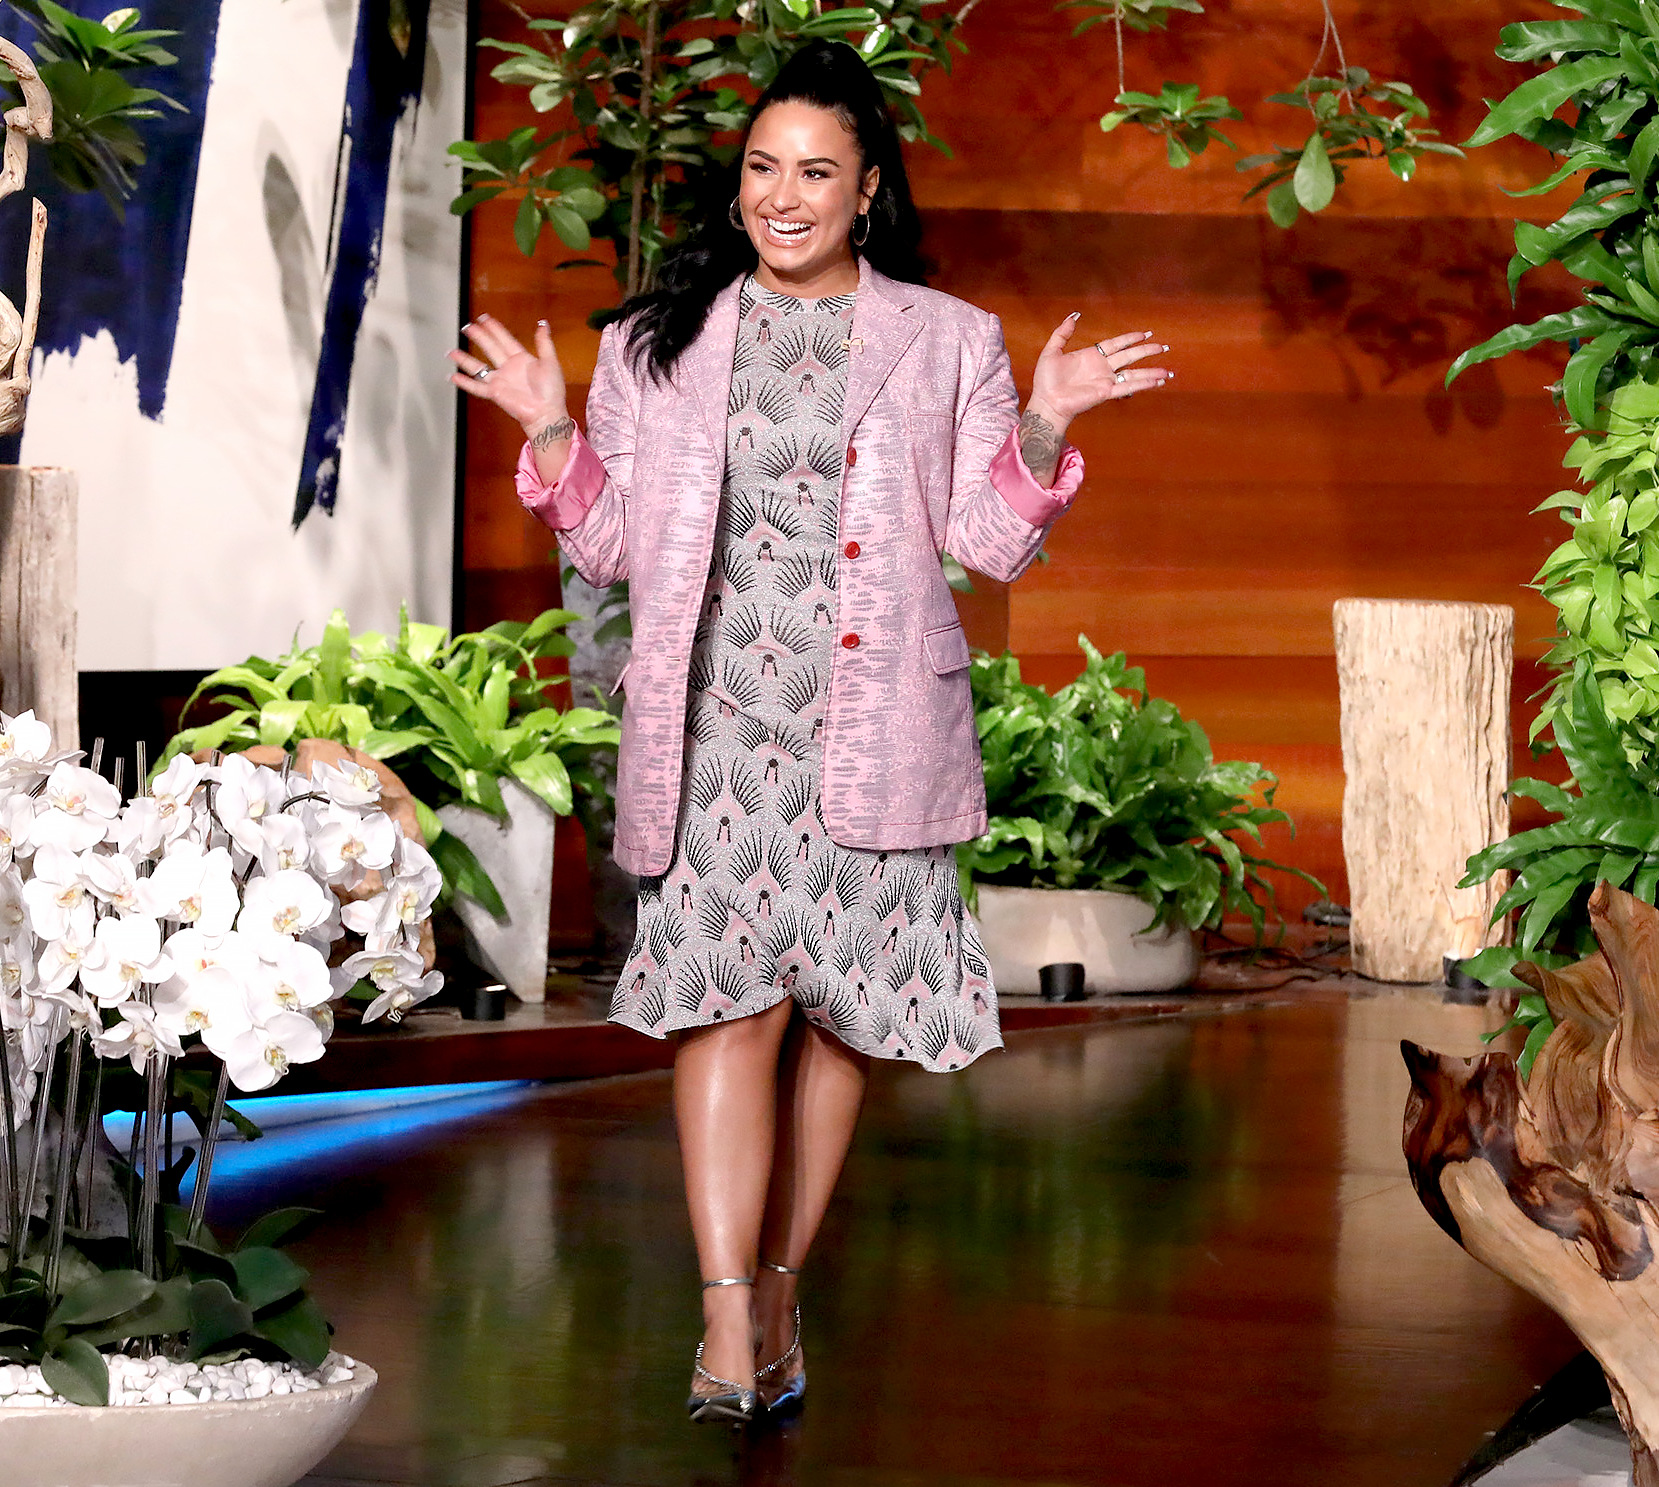 Demi Lovato Recalls Feeling 'Completely Abandoned' by Her Former Team Before 2018 Relapse 2